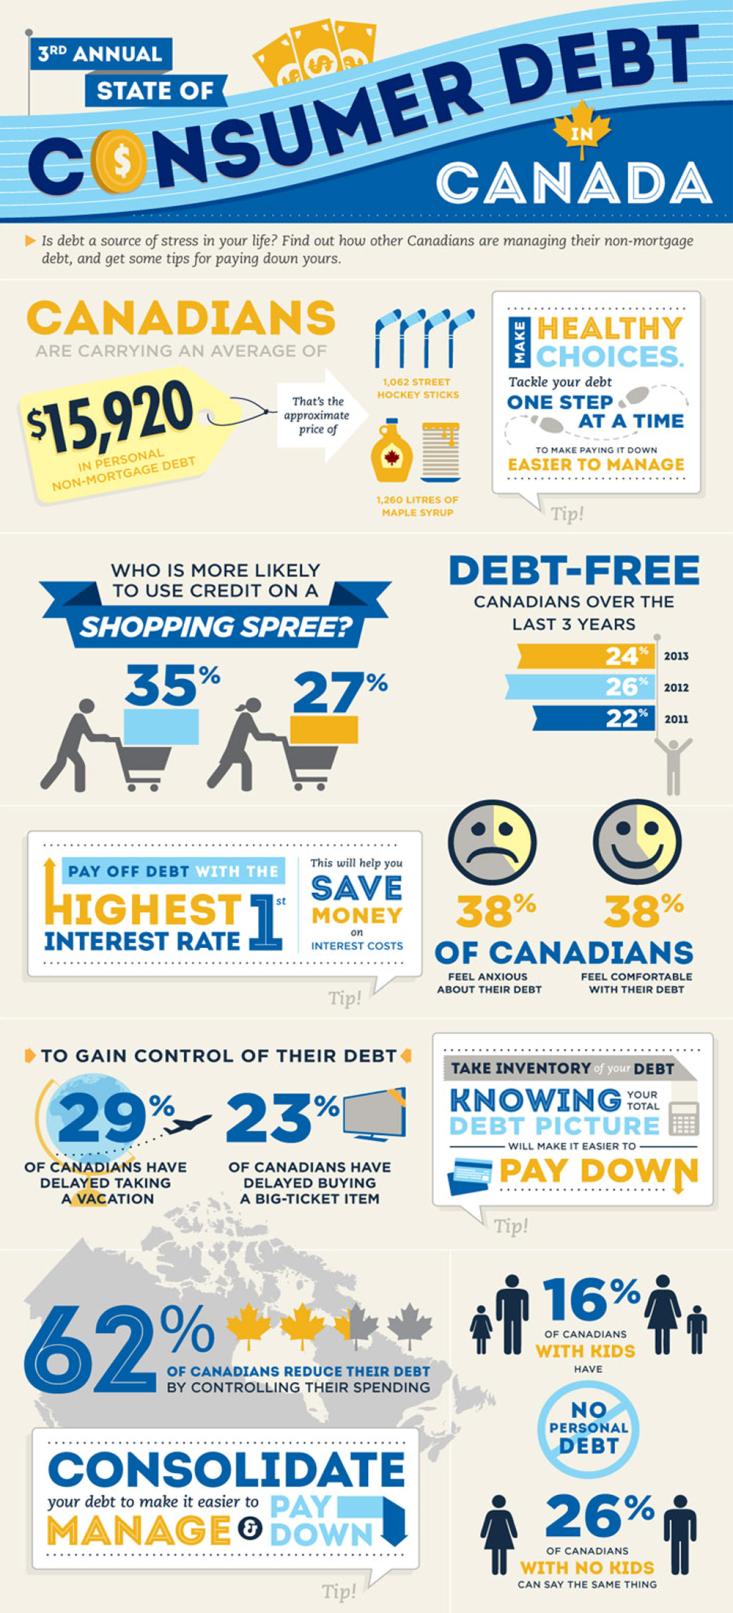 Jan 14 - Consumer Debt Infographic